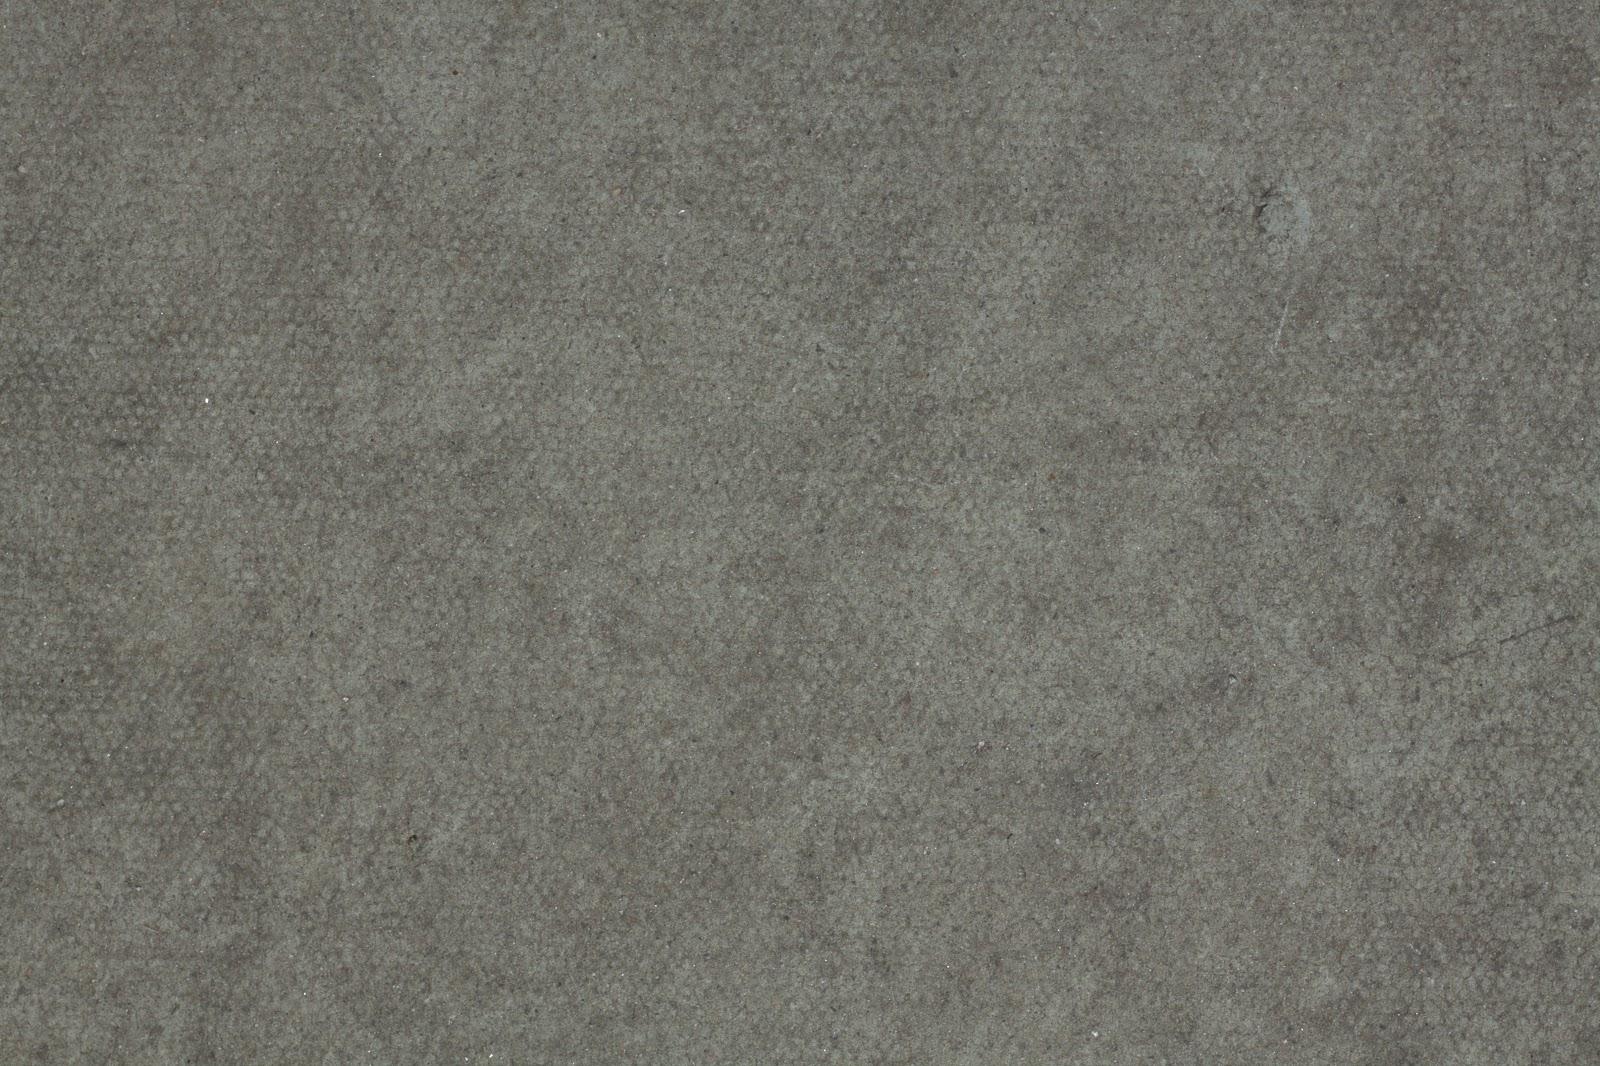 High Resolution Textures Concrete 5 Tile Ground Floor